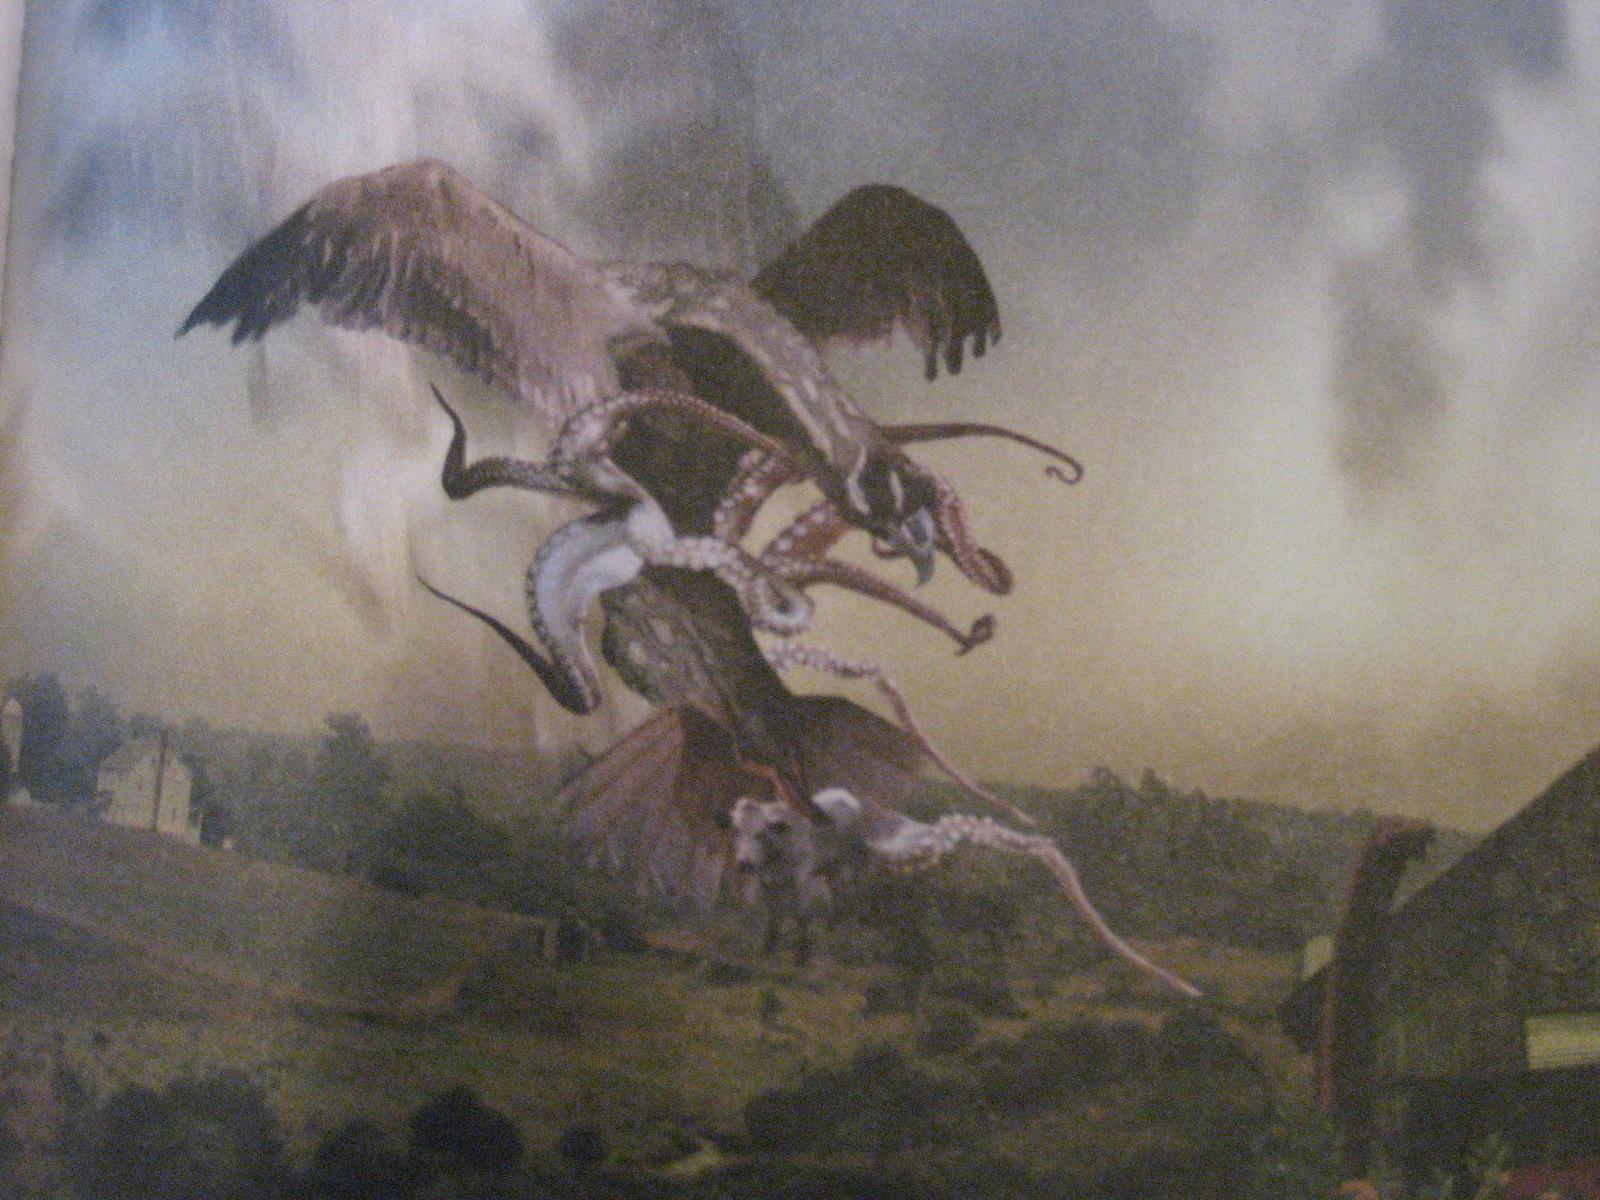 Mythological Creatures Phoenix vs Thunderbird  Enclave